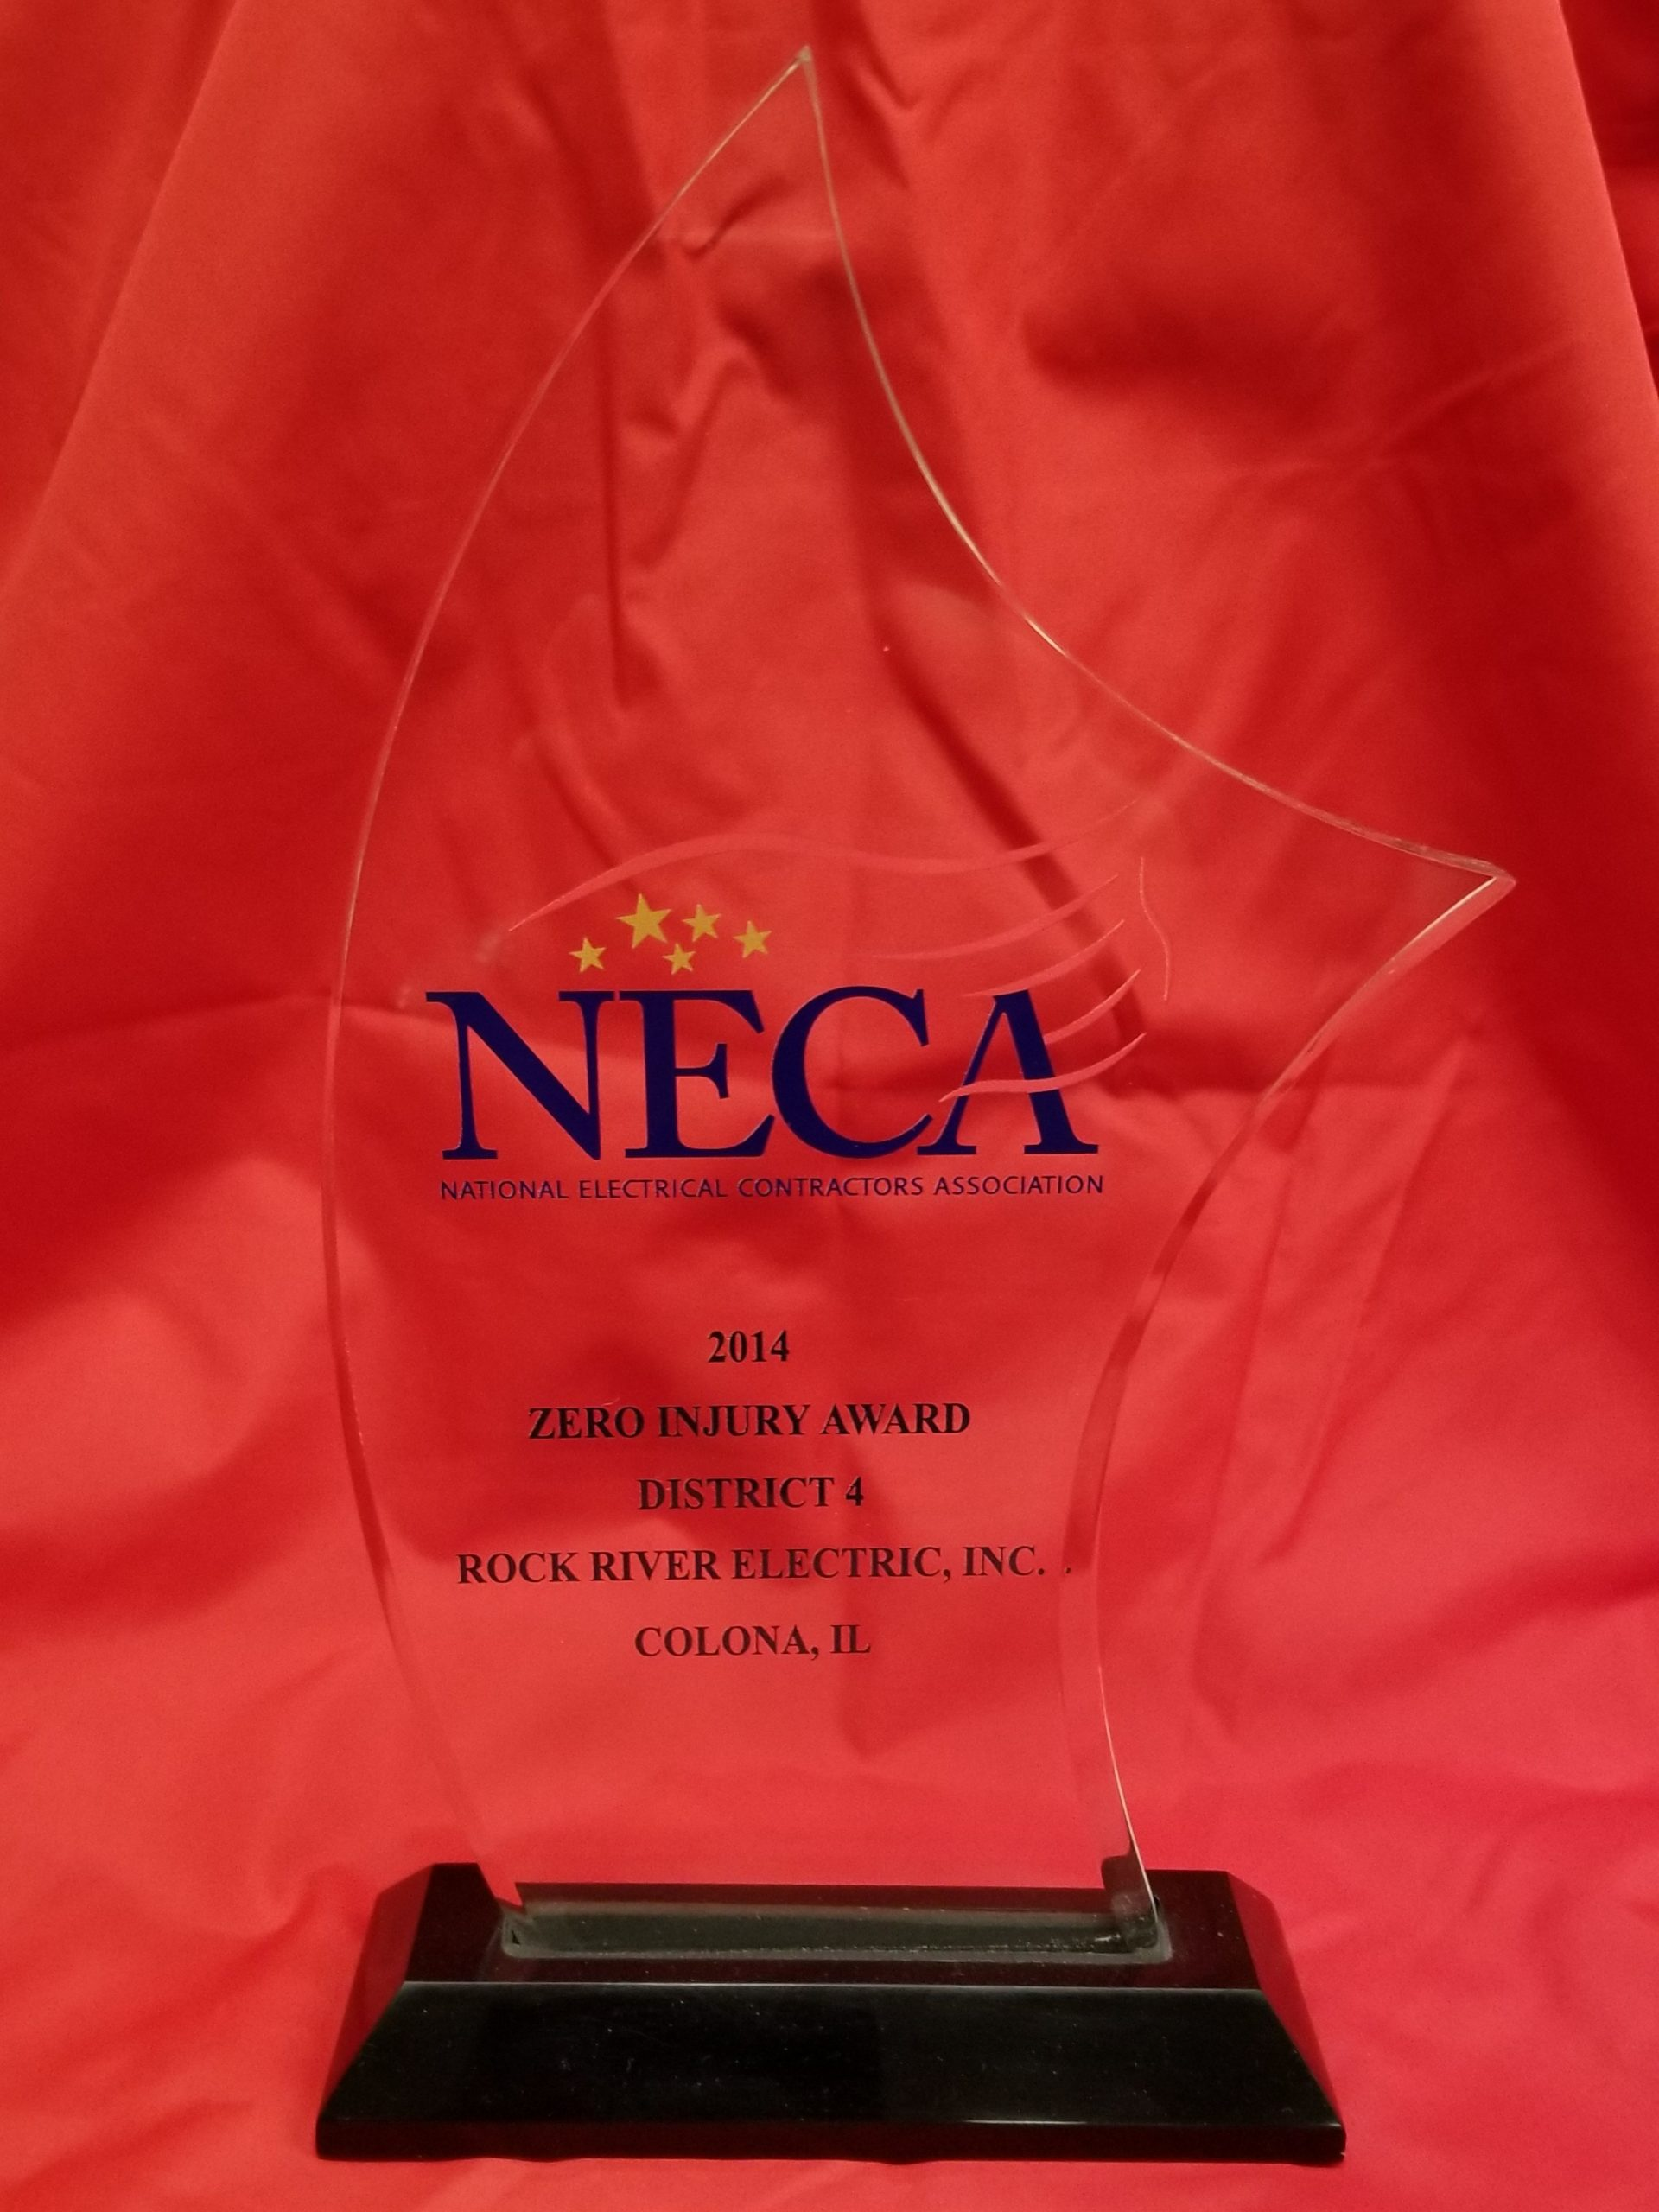 2014 NECA Safety Excellence Award & Zero Injury Award